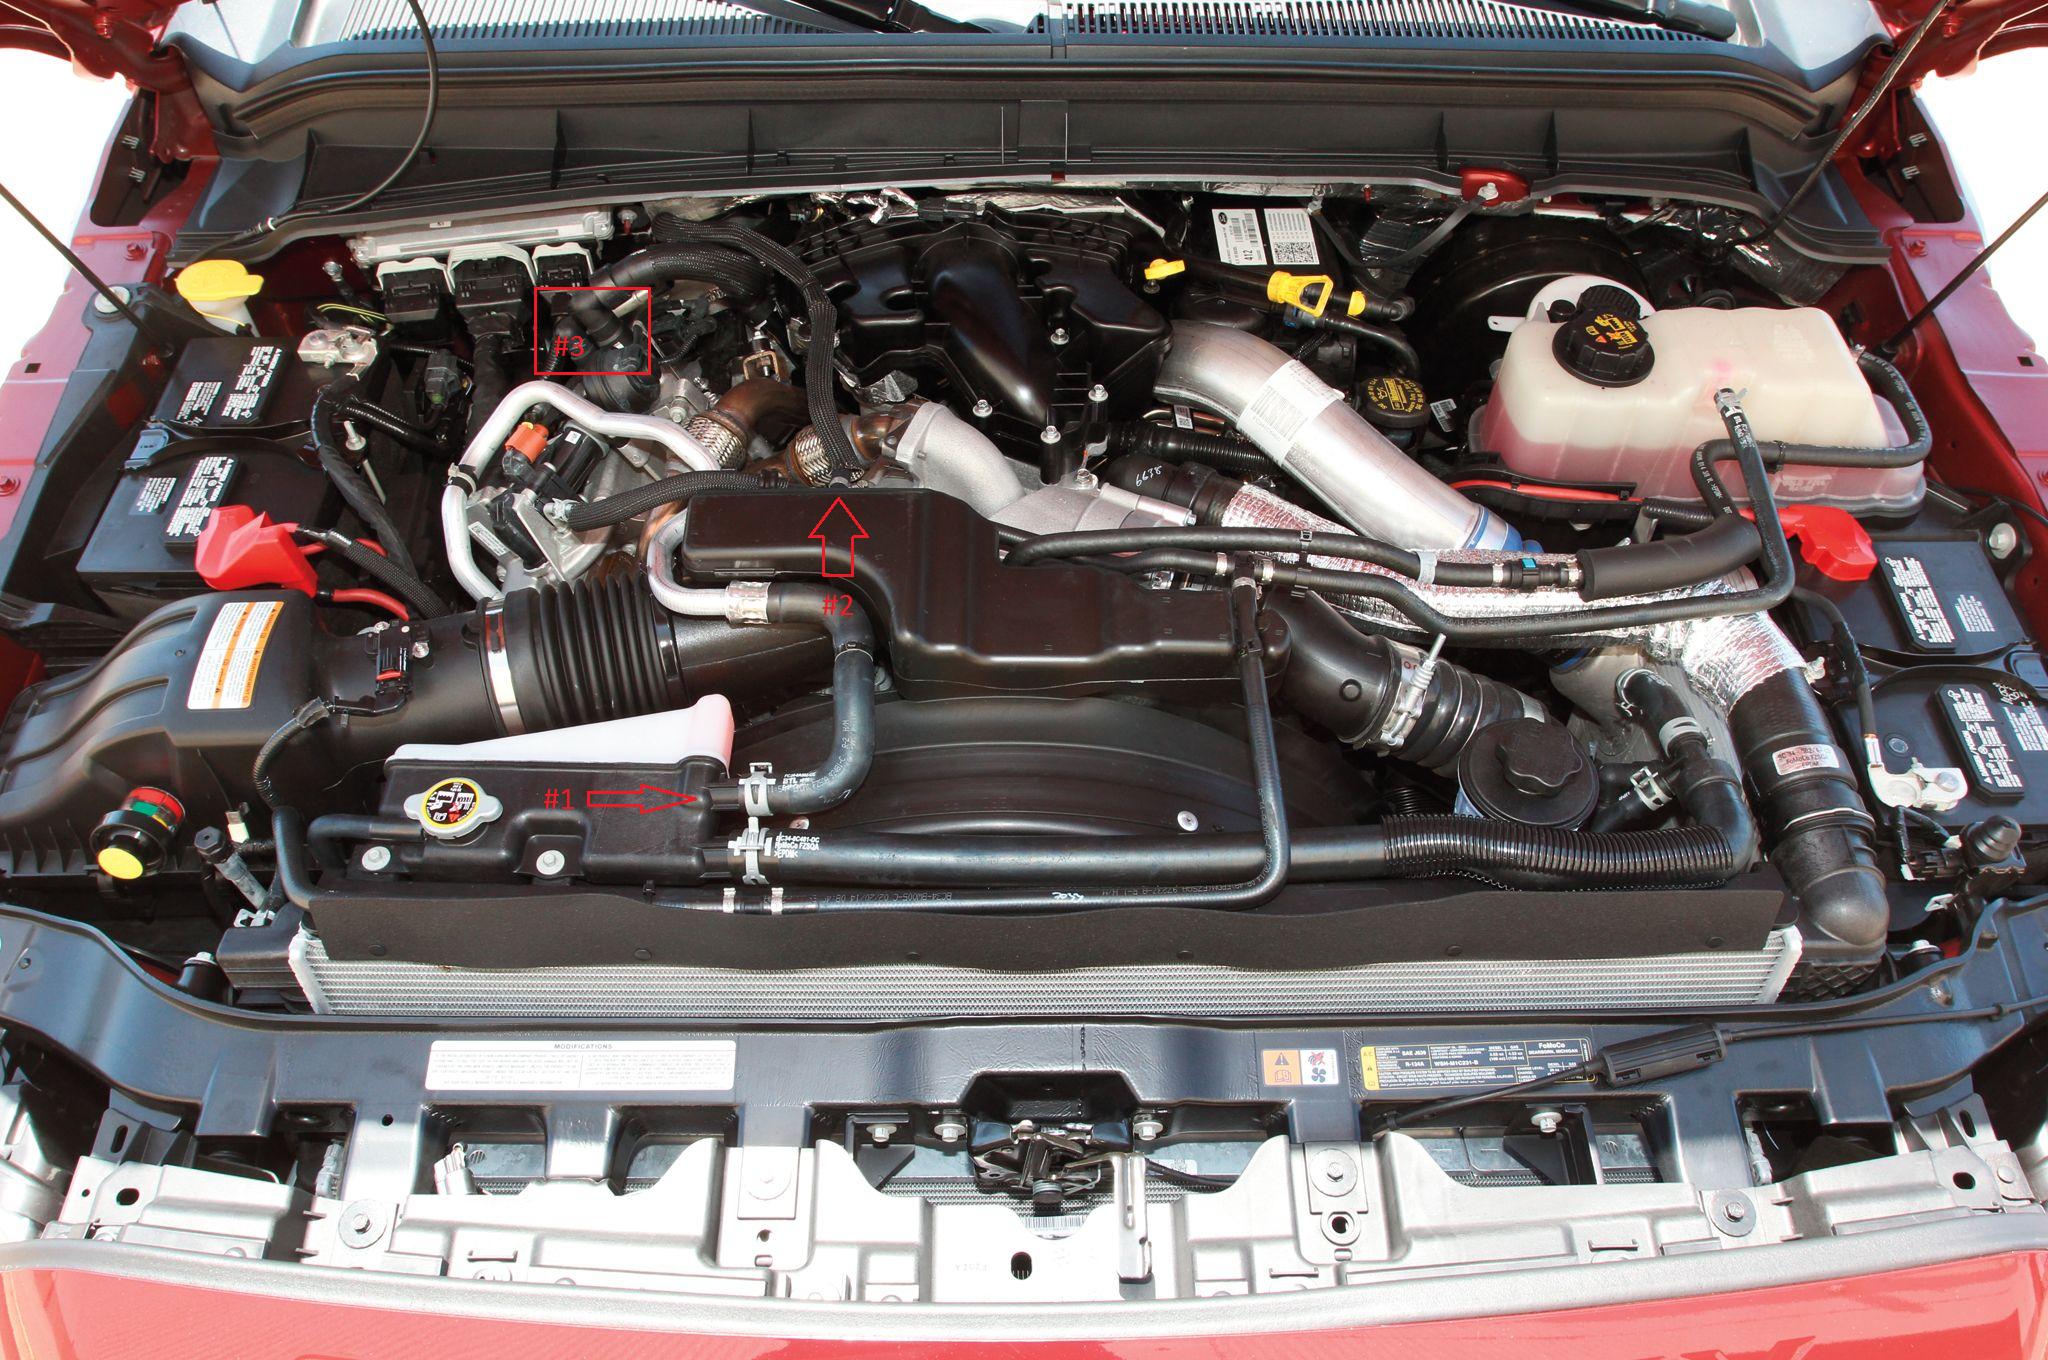 6 7 Powerstroke Egr Delete | Upcoming Car Release 2020